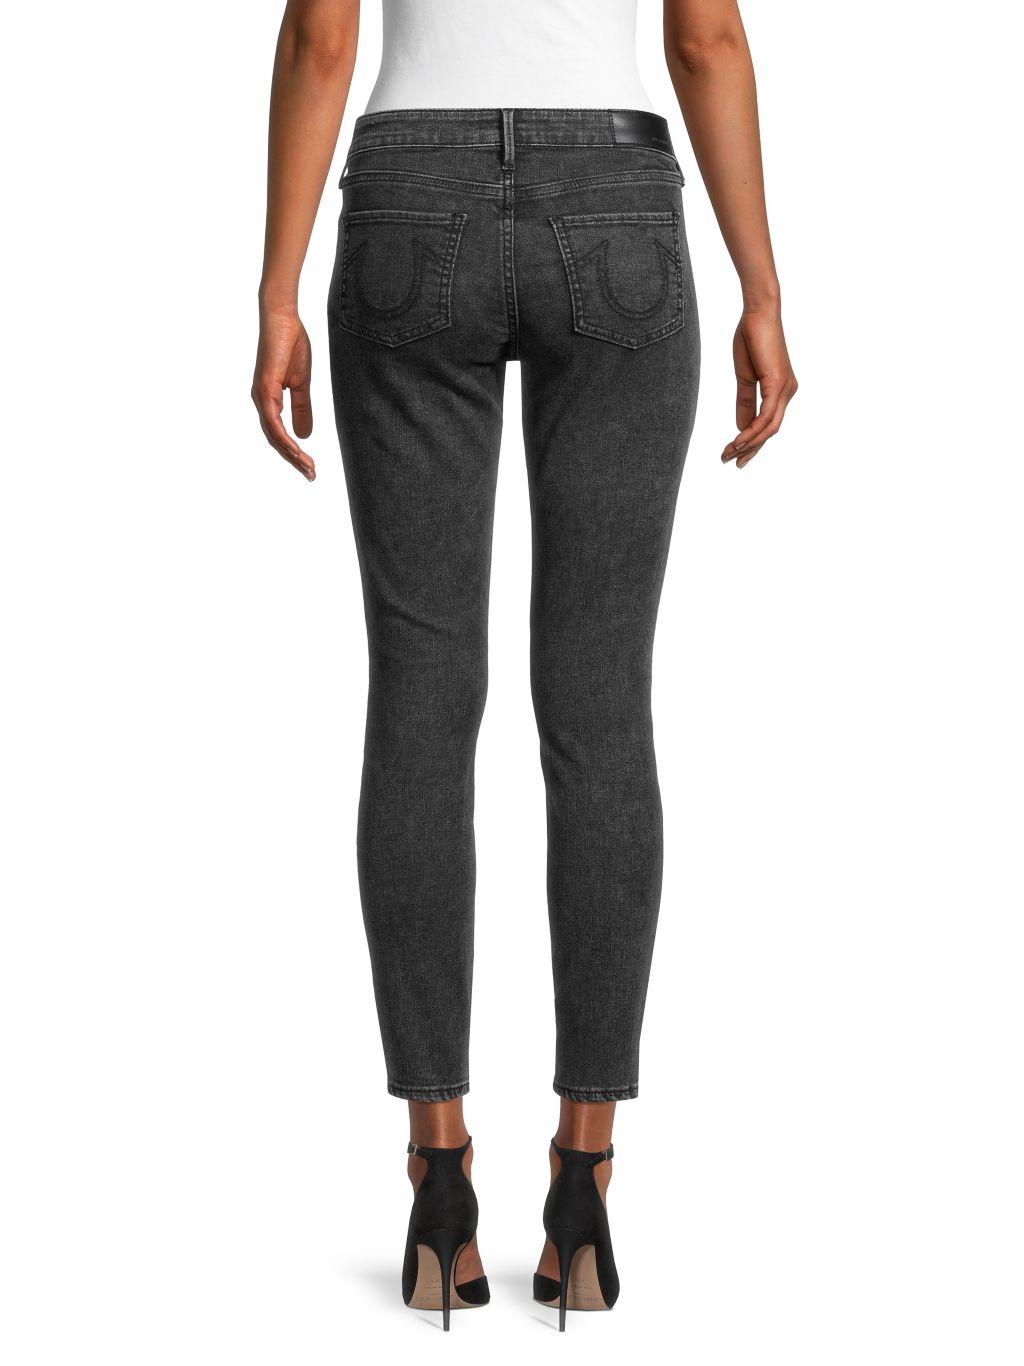 True Religion Hallie Mid-Rise Super-Skinny Ankle Jeans